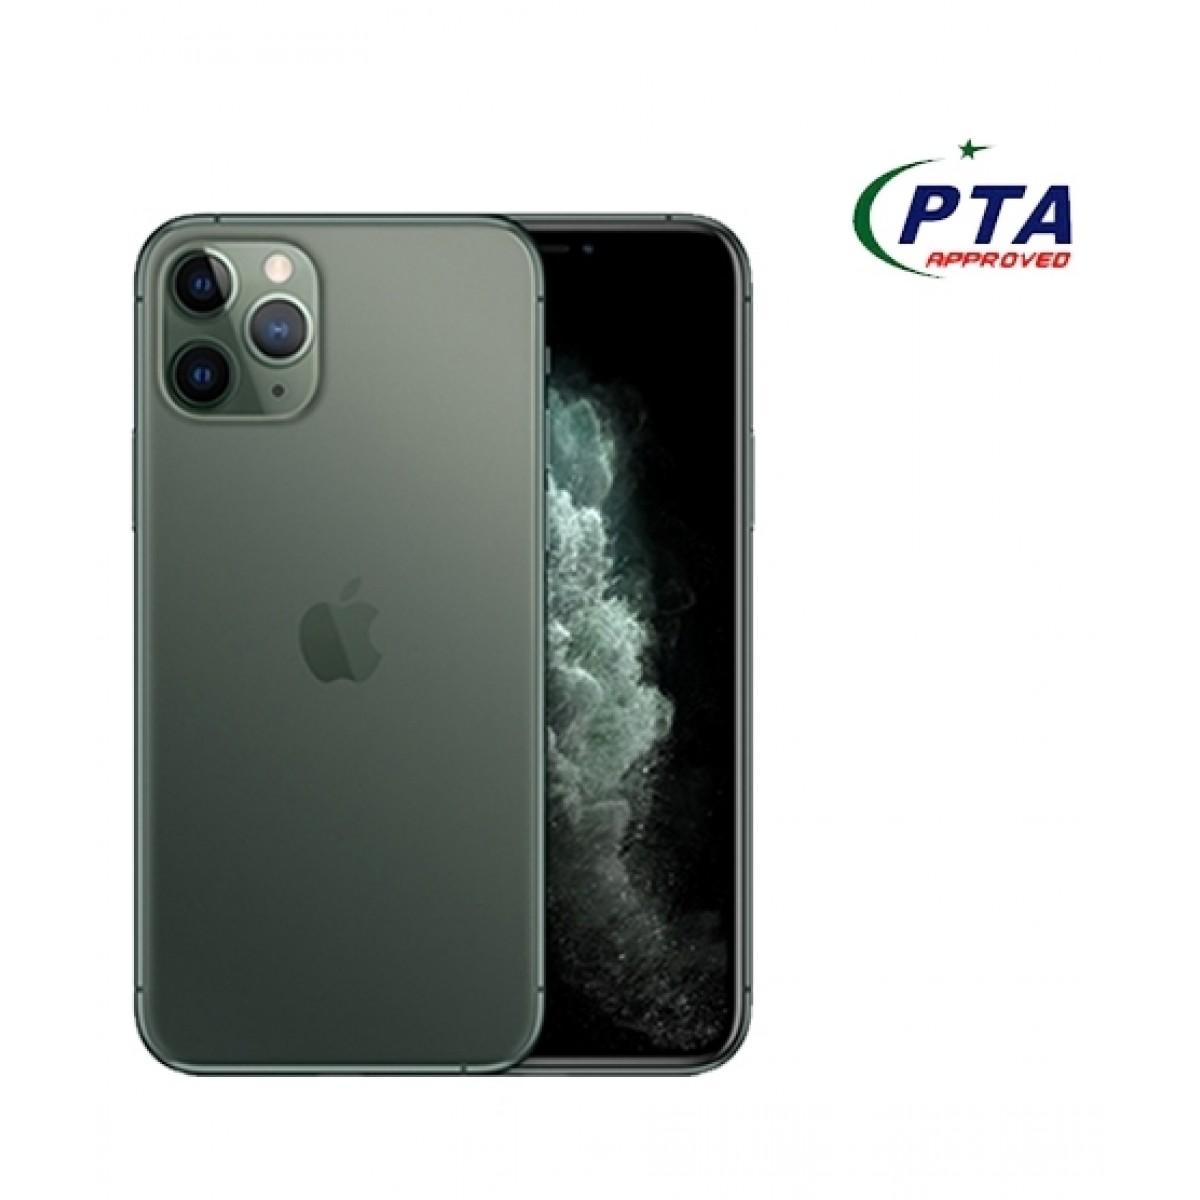 Apple iPhone 11 Pro Max 512GB Dual Sim Midnight Green - Official Warranty